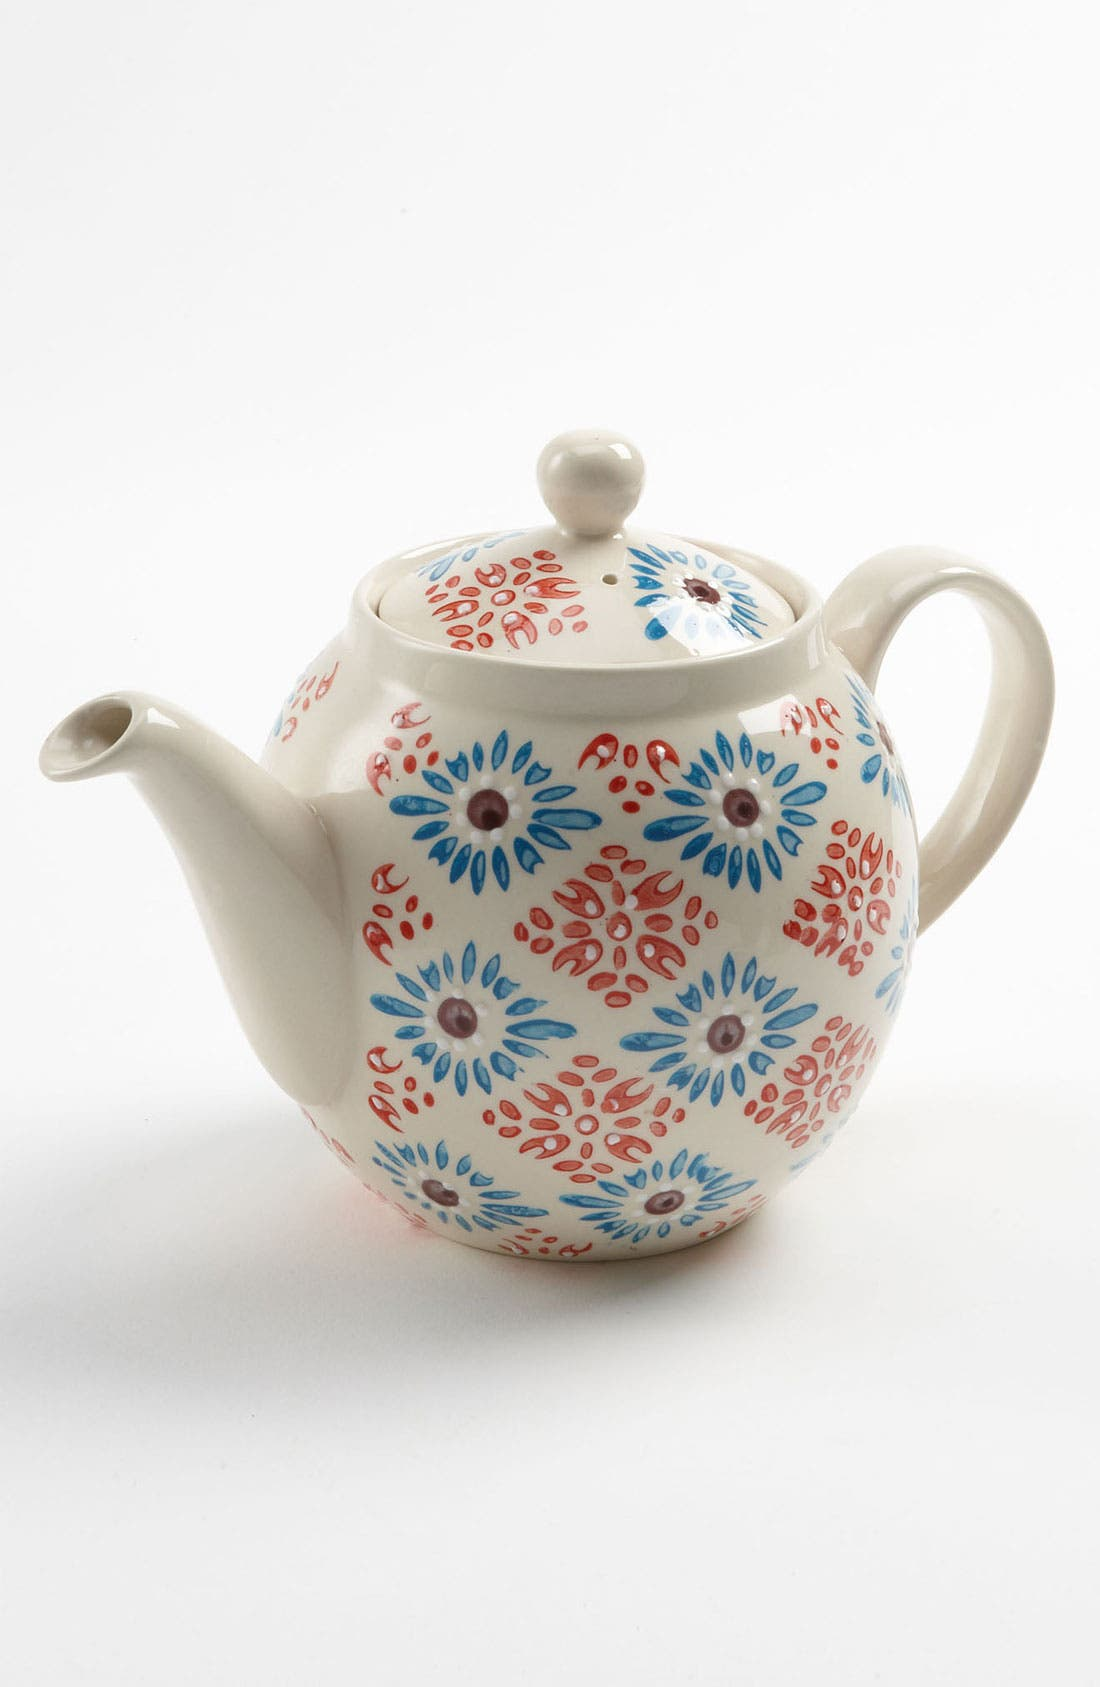 Main Image - Chehoma Atelier d'Ambiances Teapot